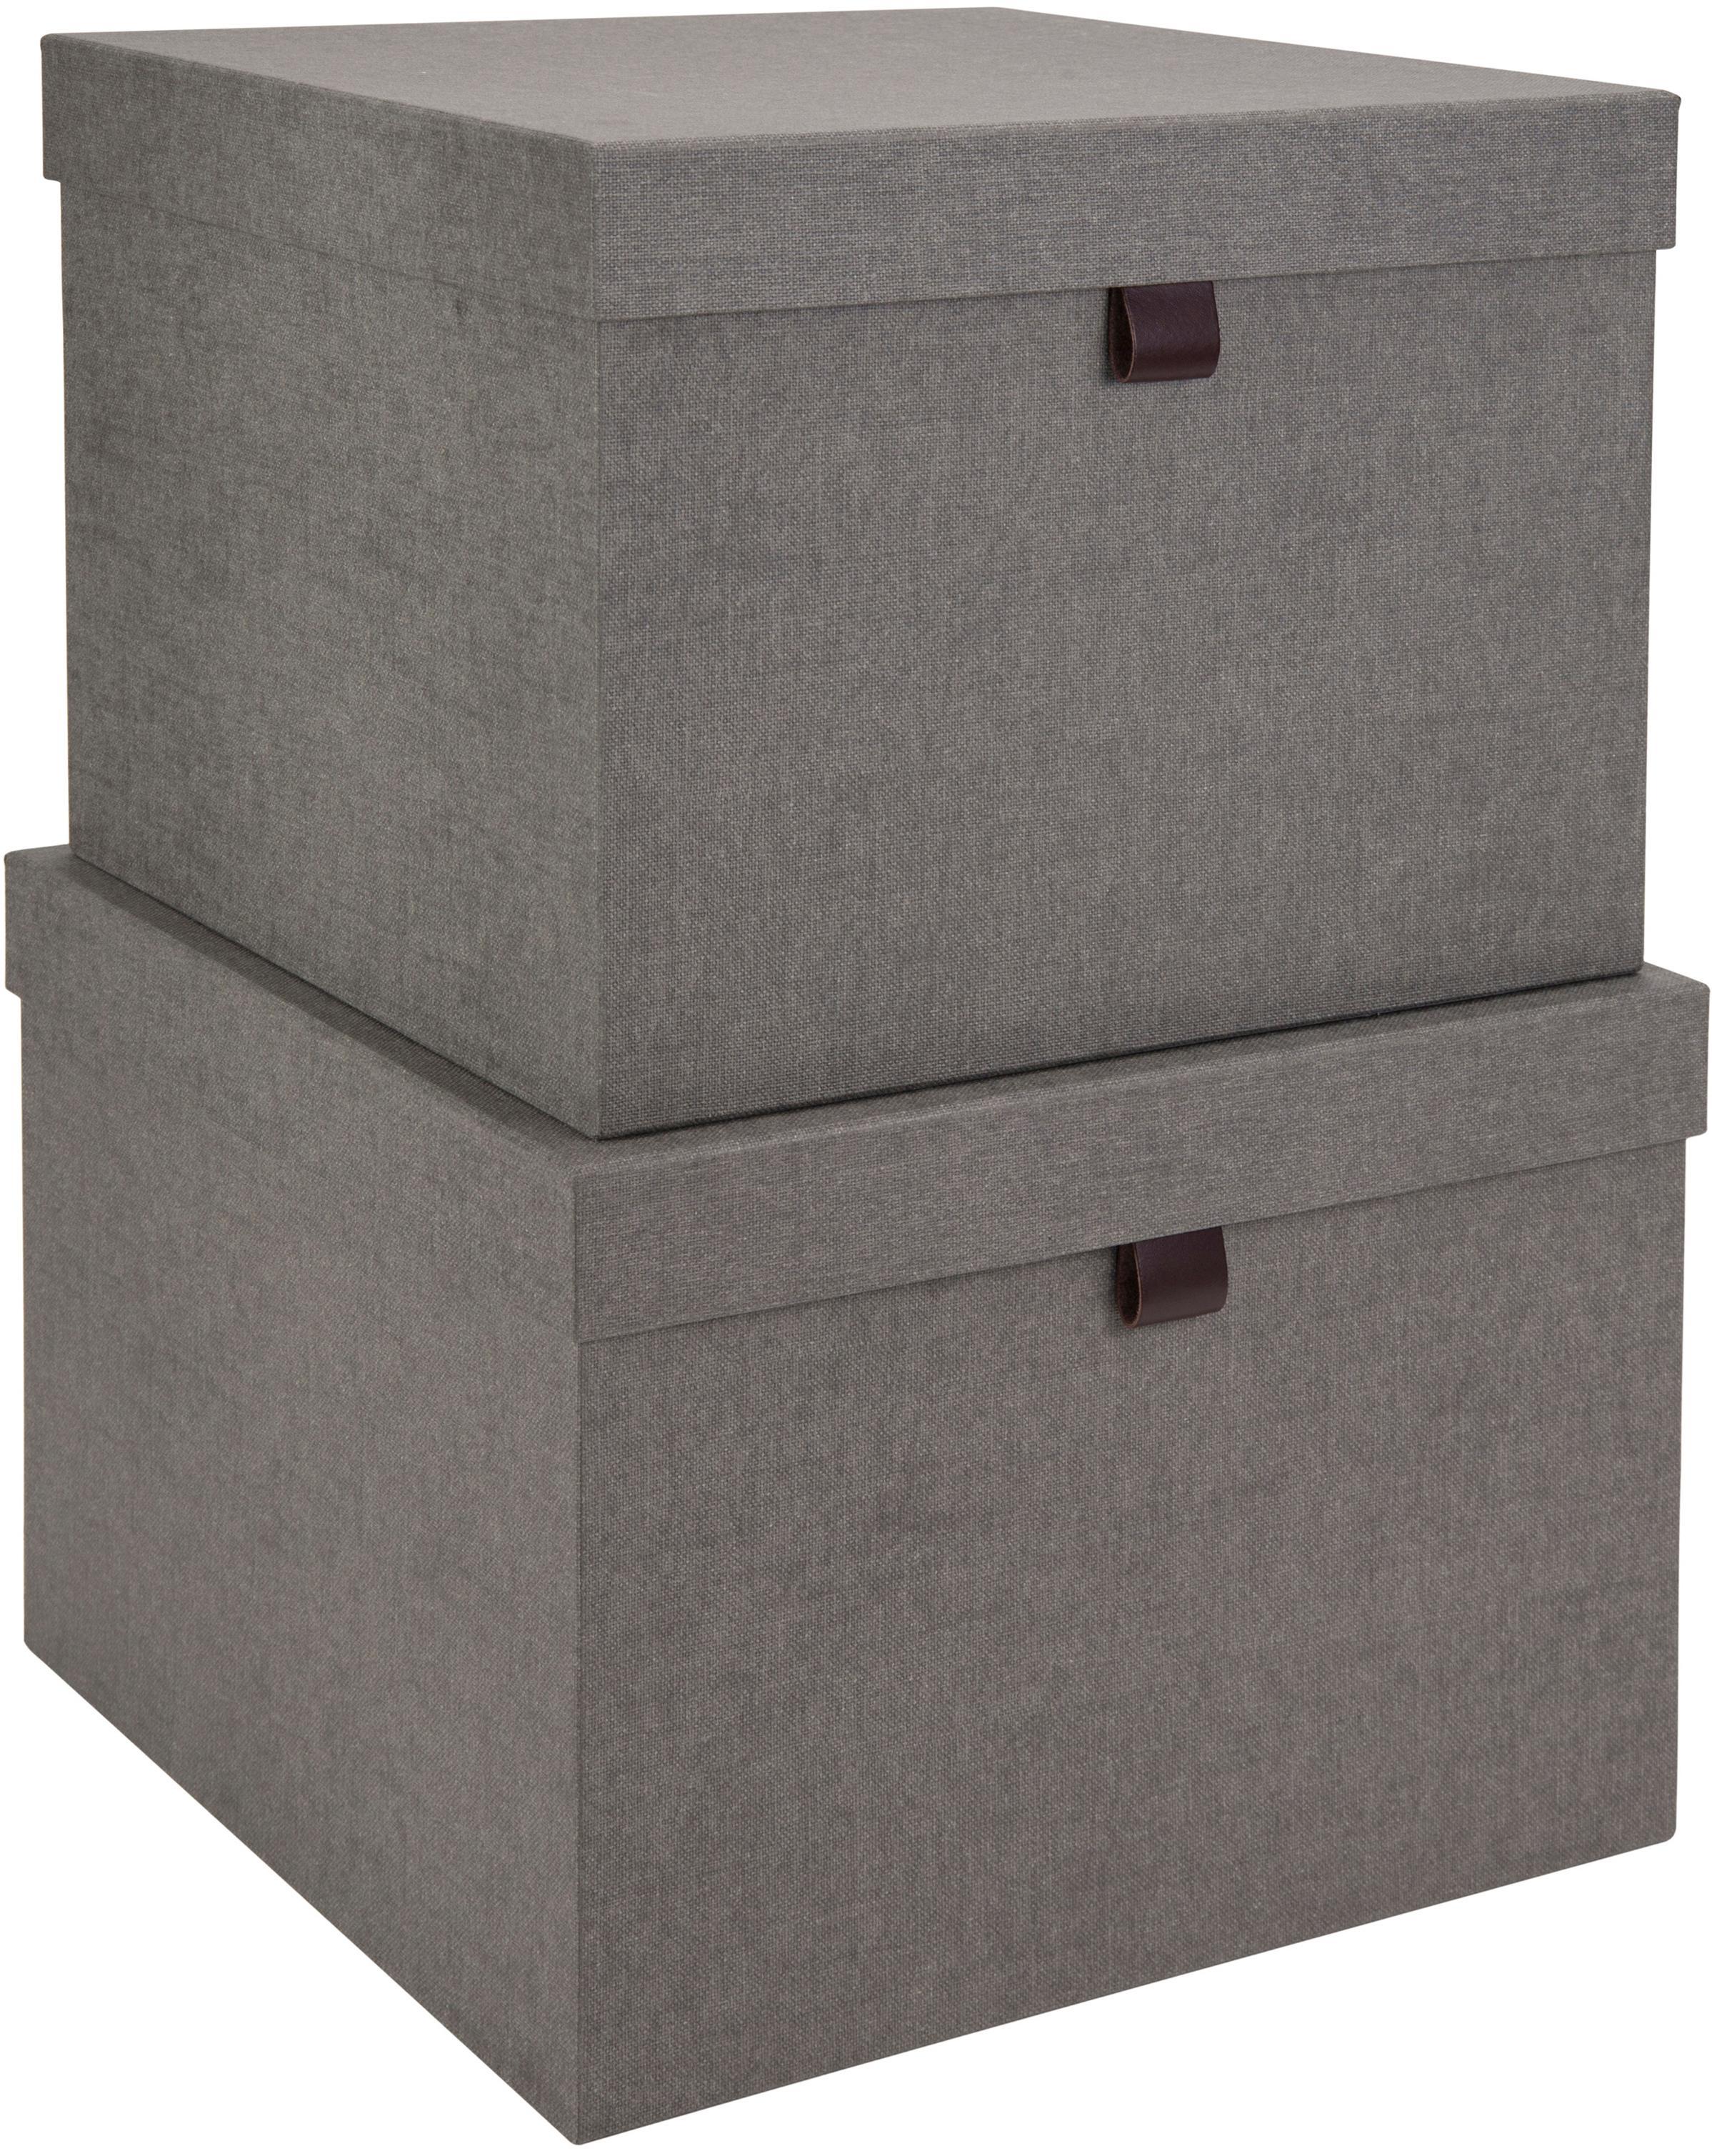 Set de cajas Tristan, 2pzas., Caja: cartón laminado, Gris, Set de diferentes tamaños